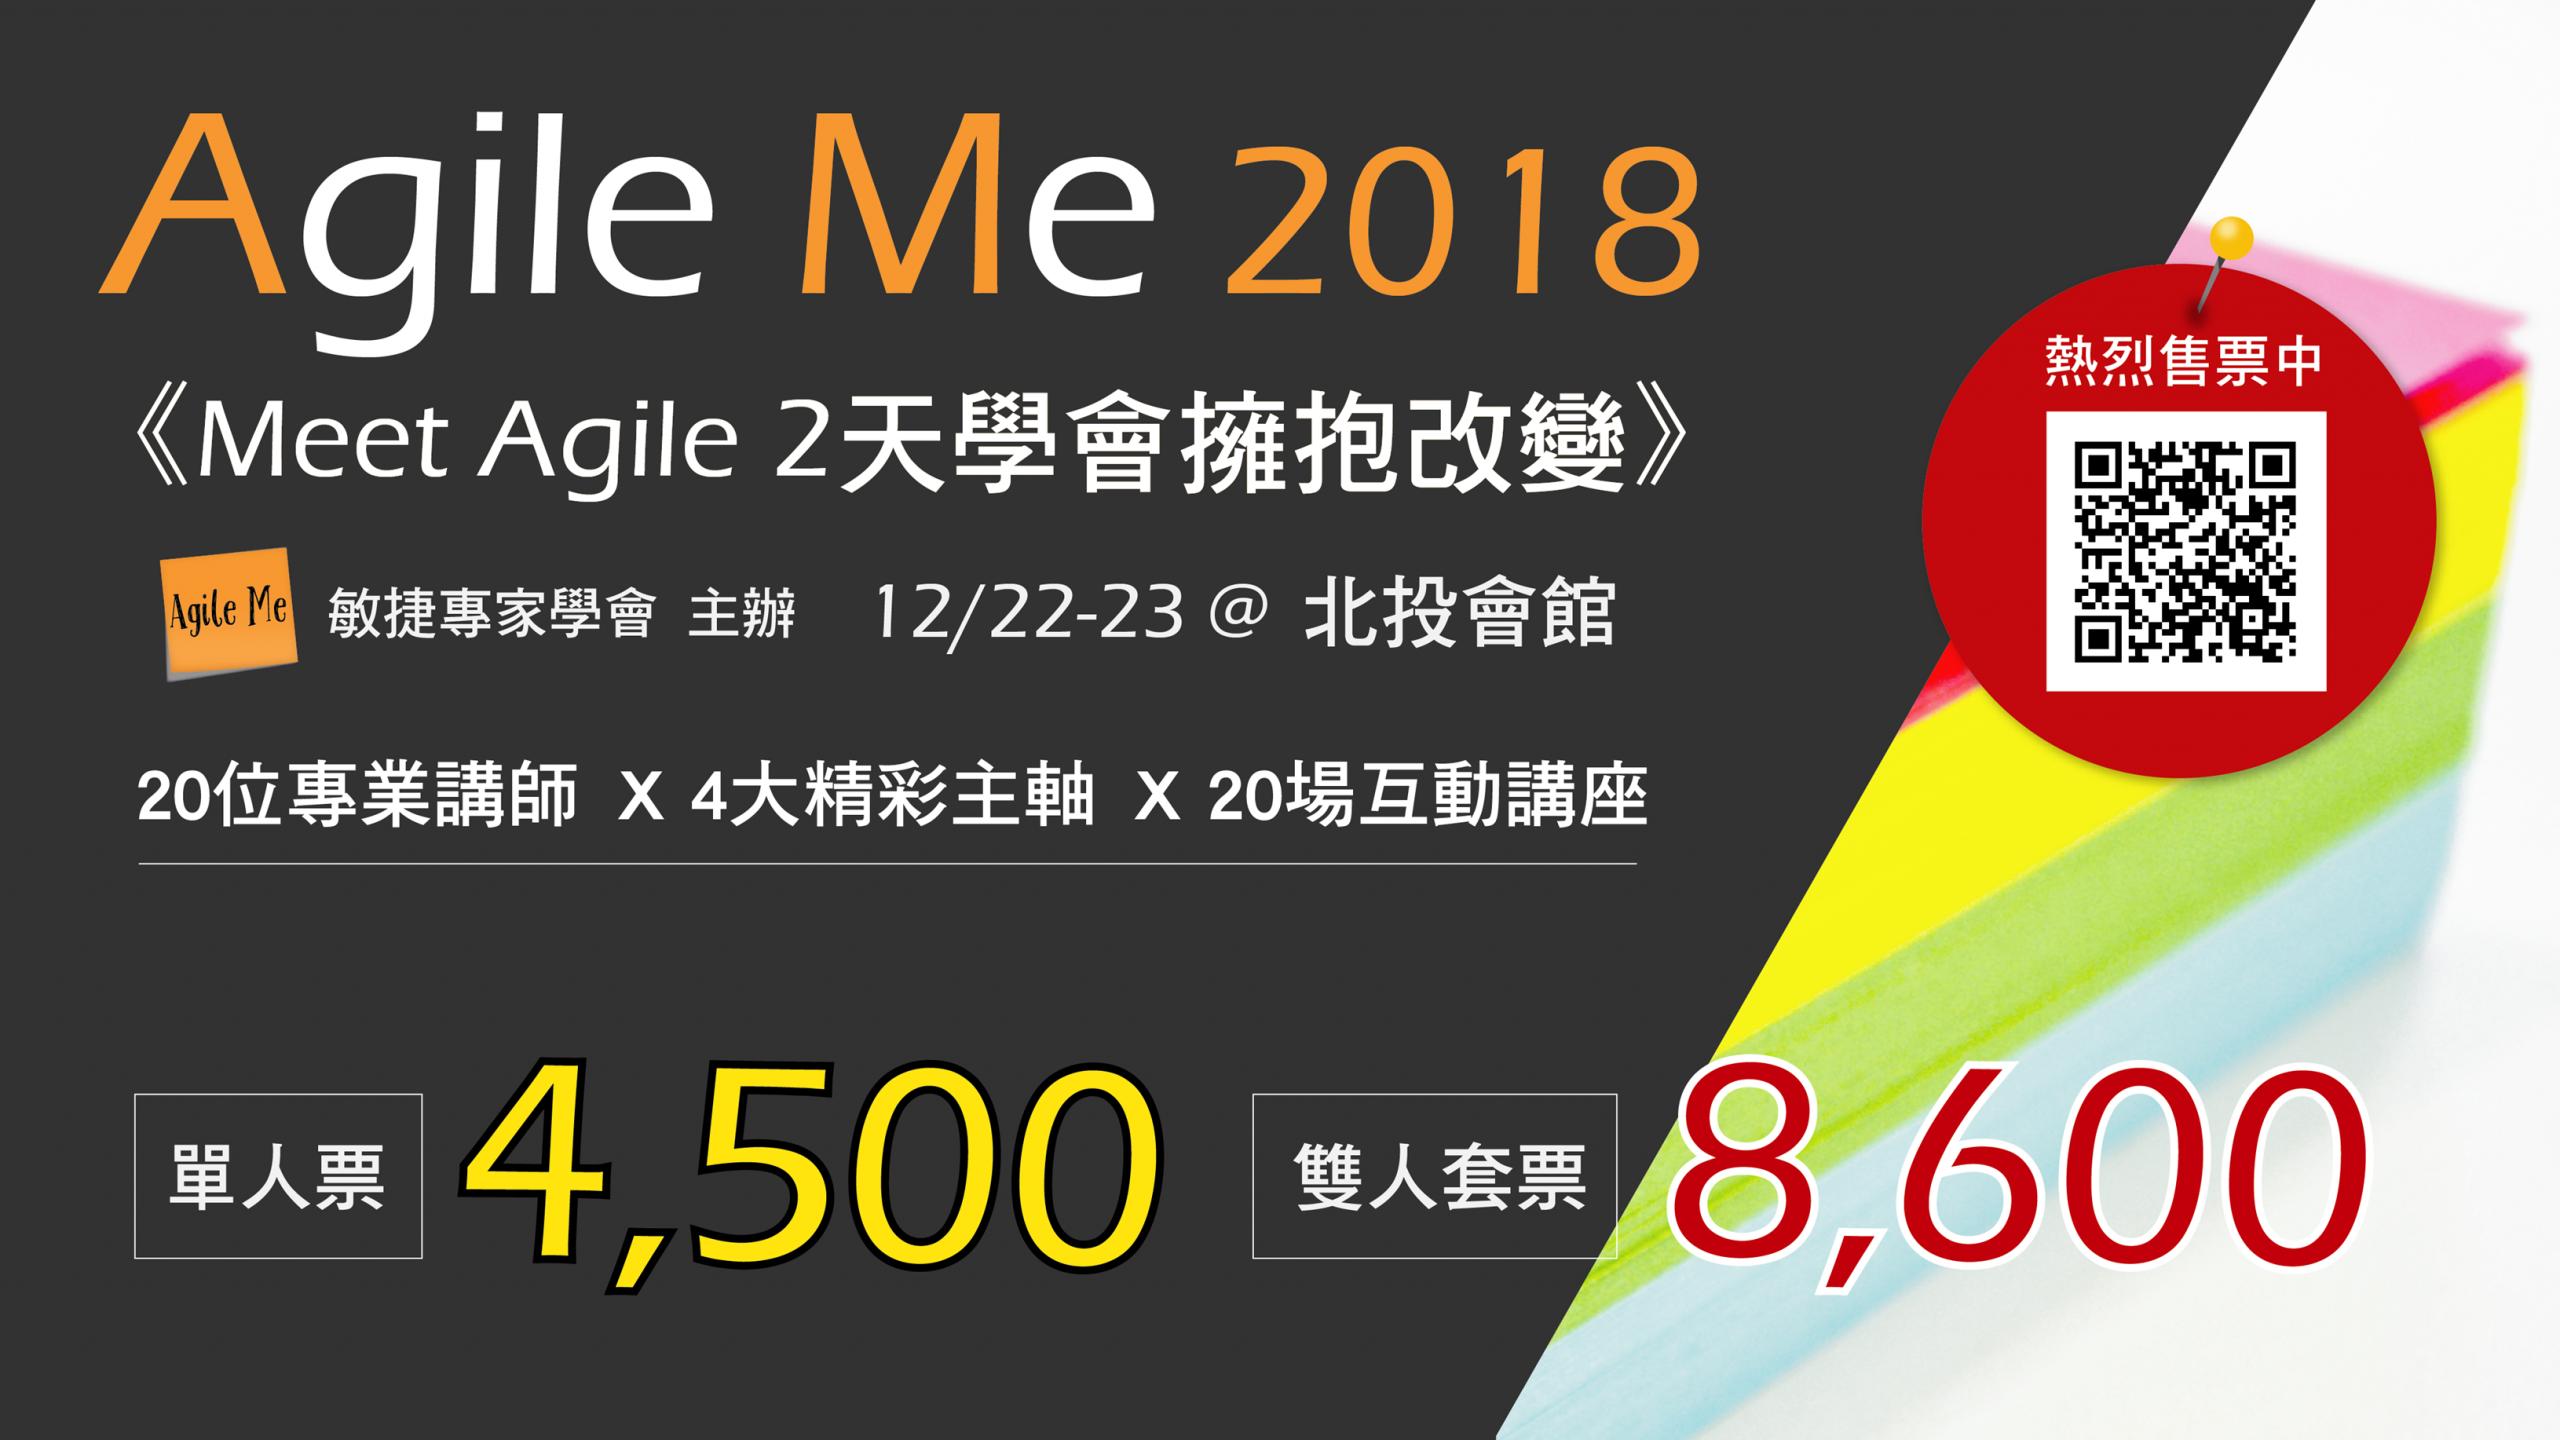 【Agile Me 2018 】全課程公布